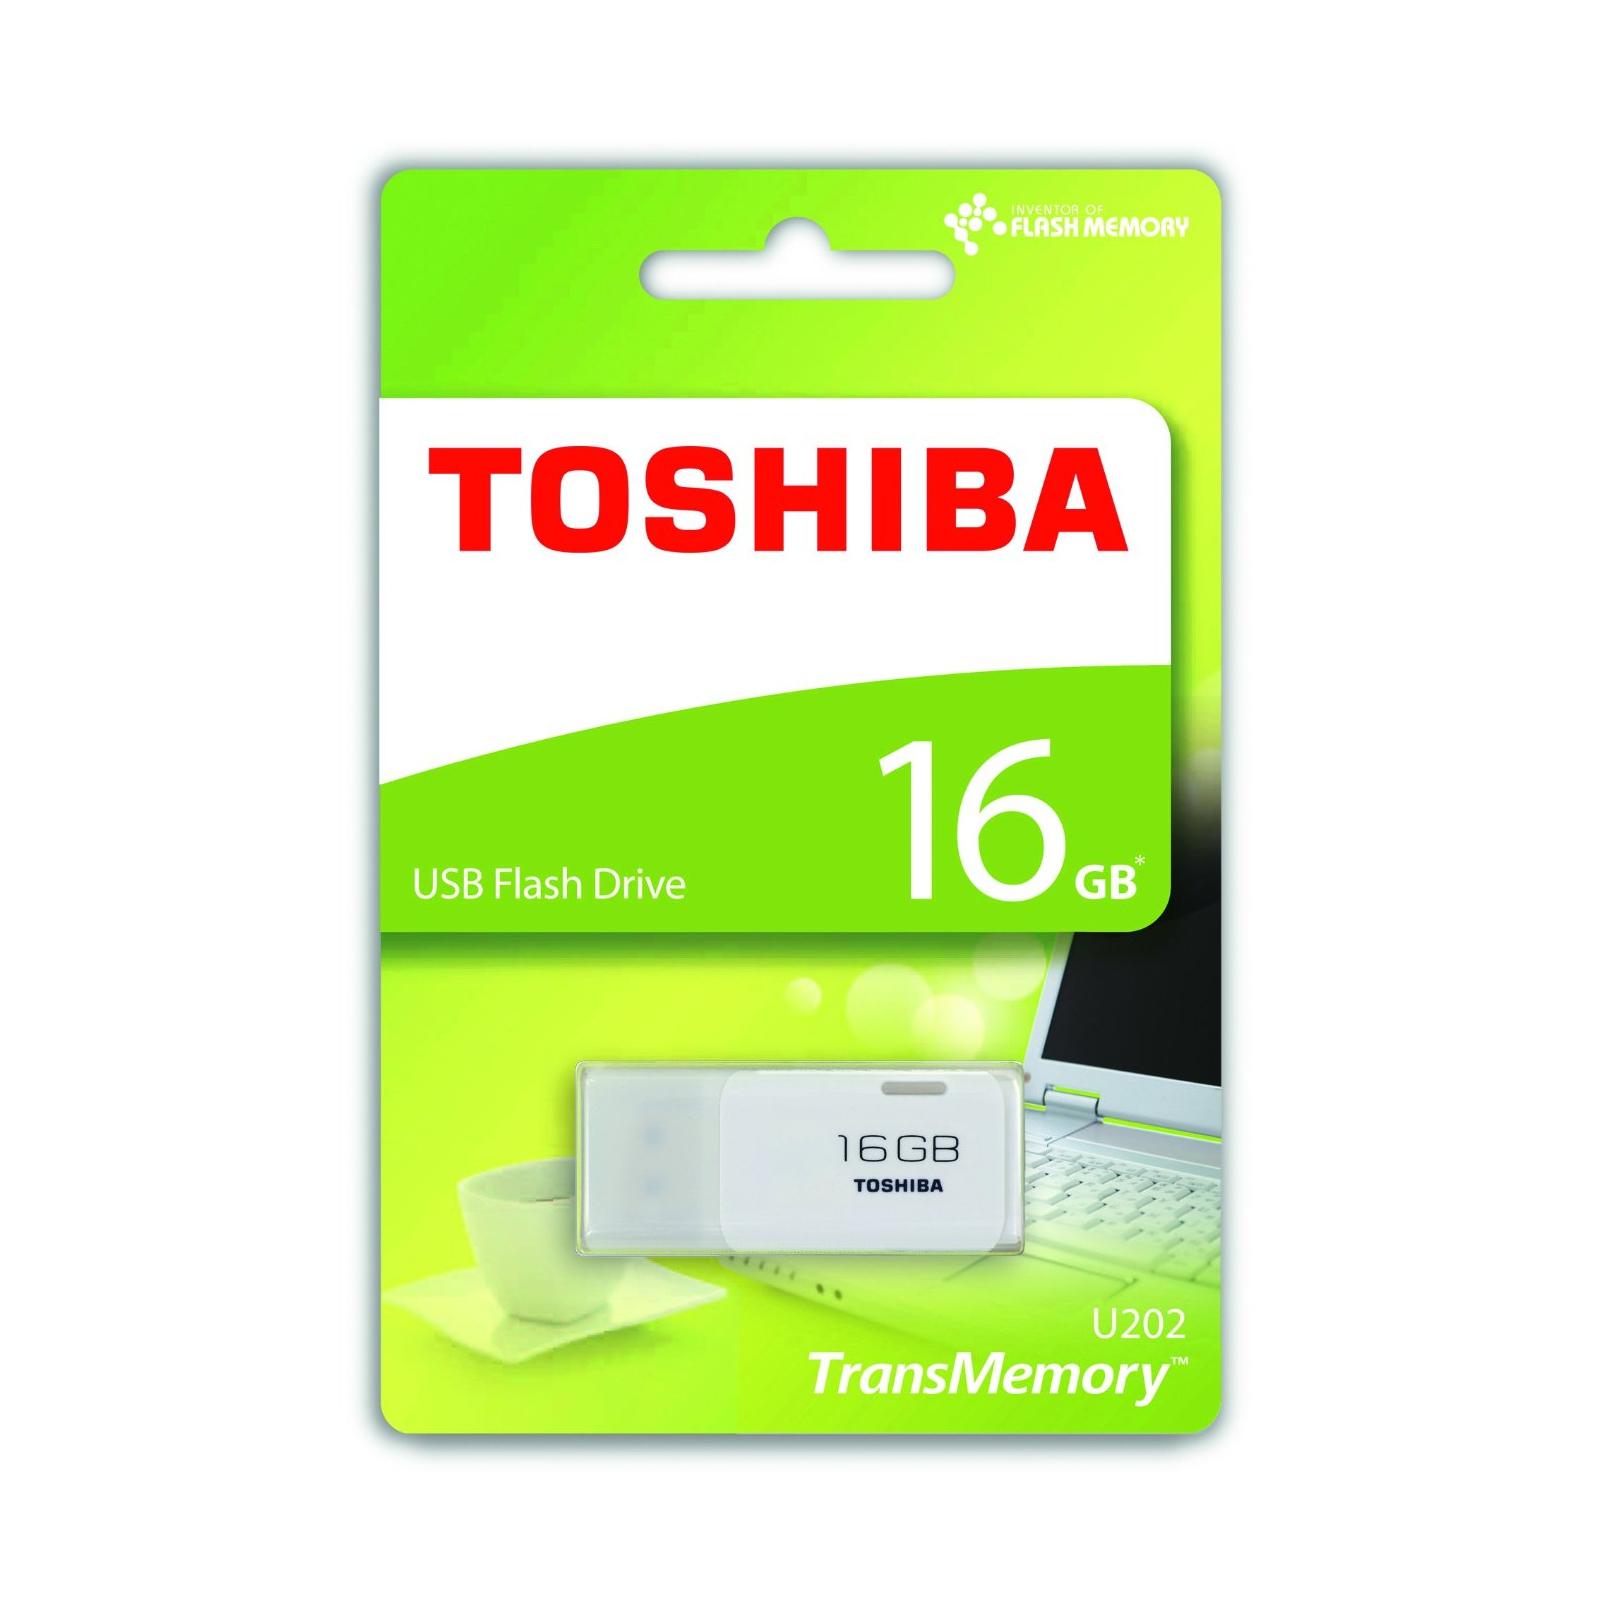 USB флеш накопитель TOSHIBA 16GB U202 White USB 2.0 (THN-U202W0160E4) изображение 2